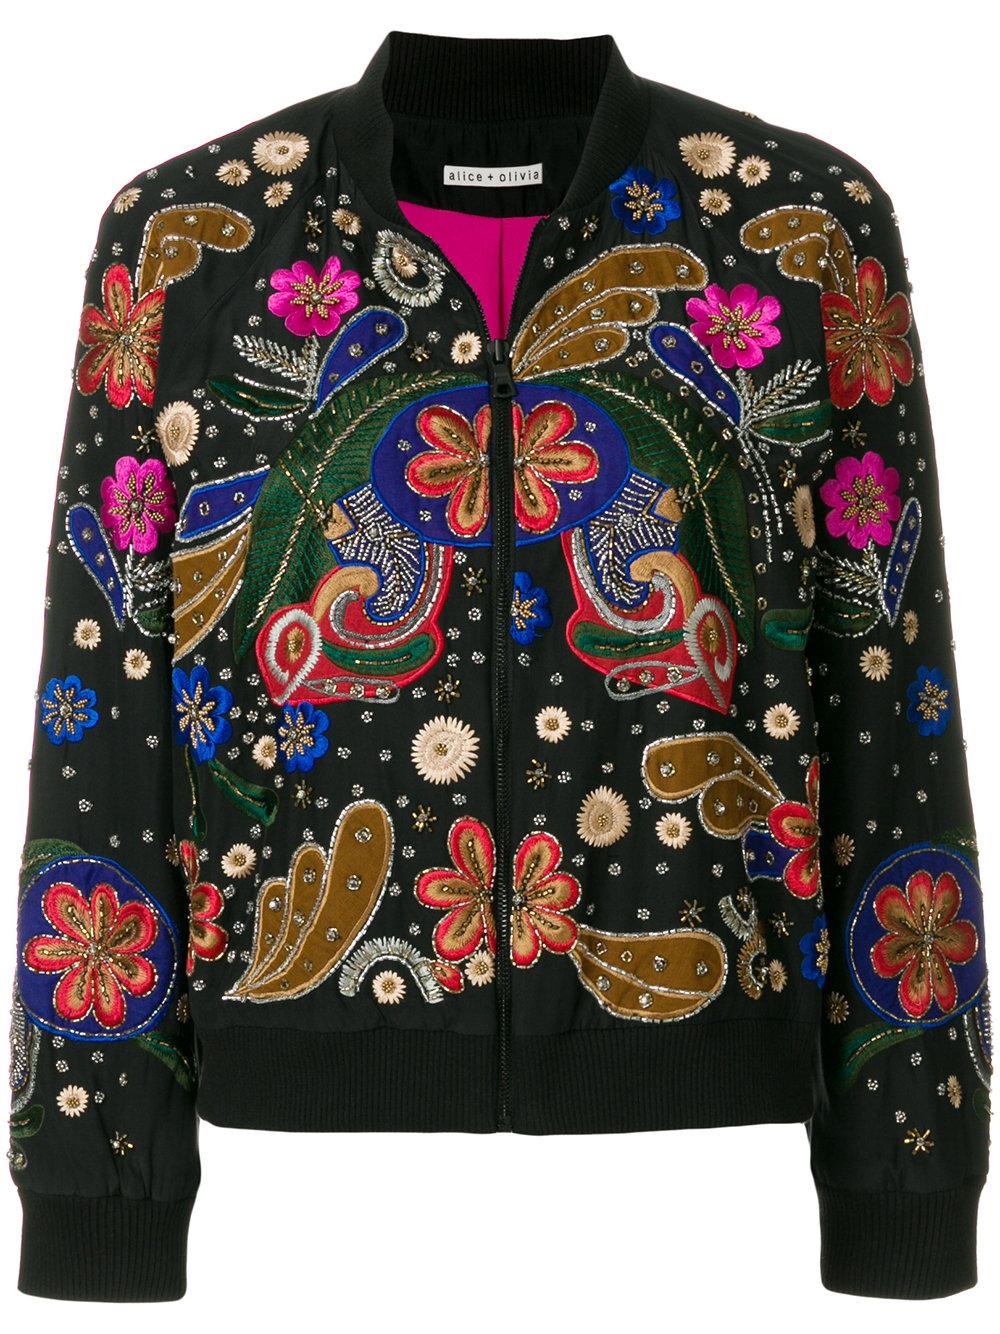 ALICE+OLIVIA bomber jacket - $795